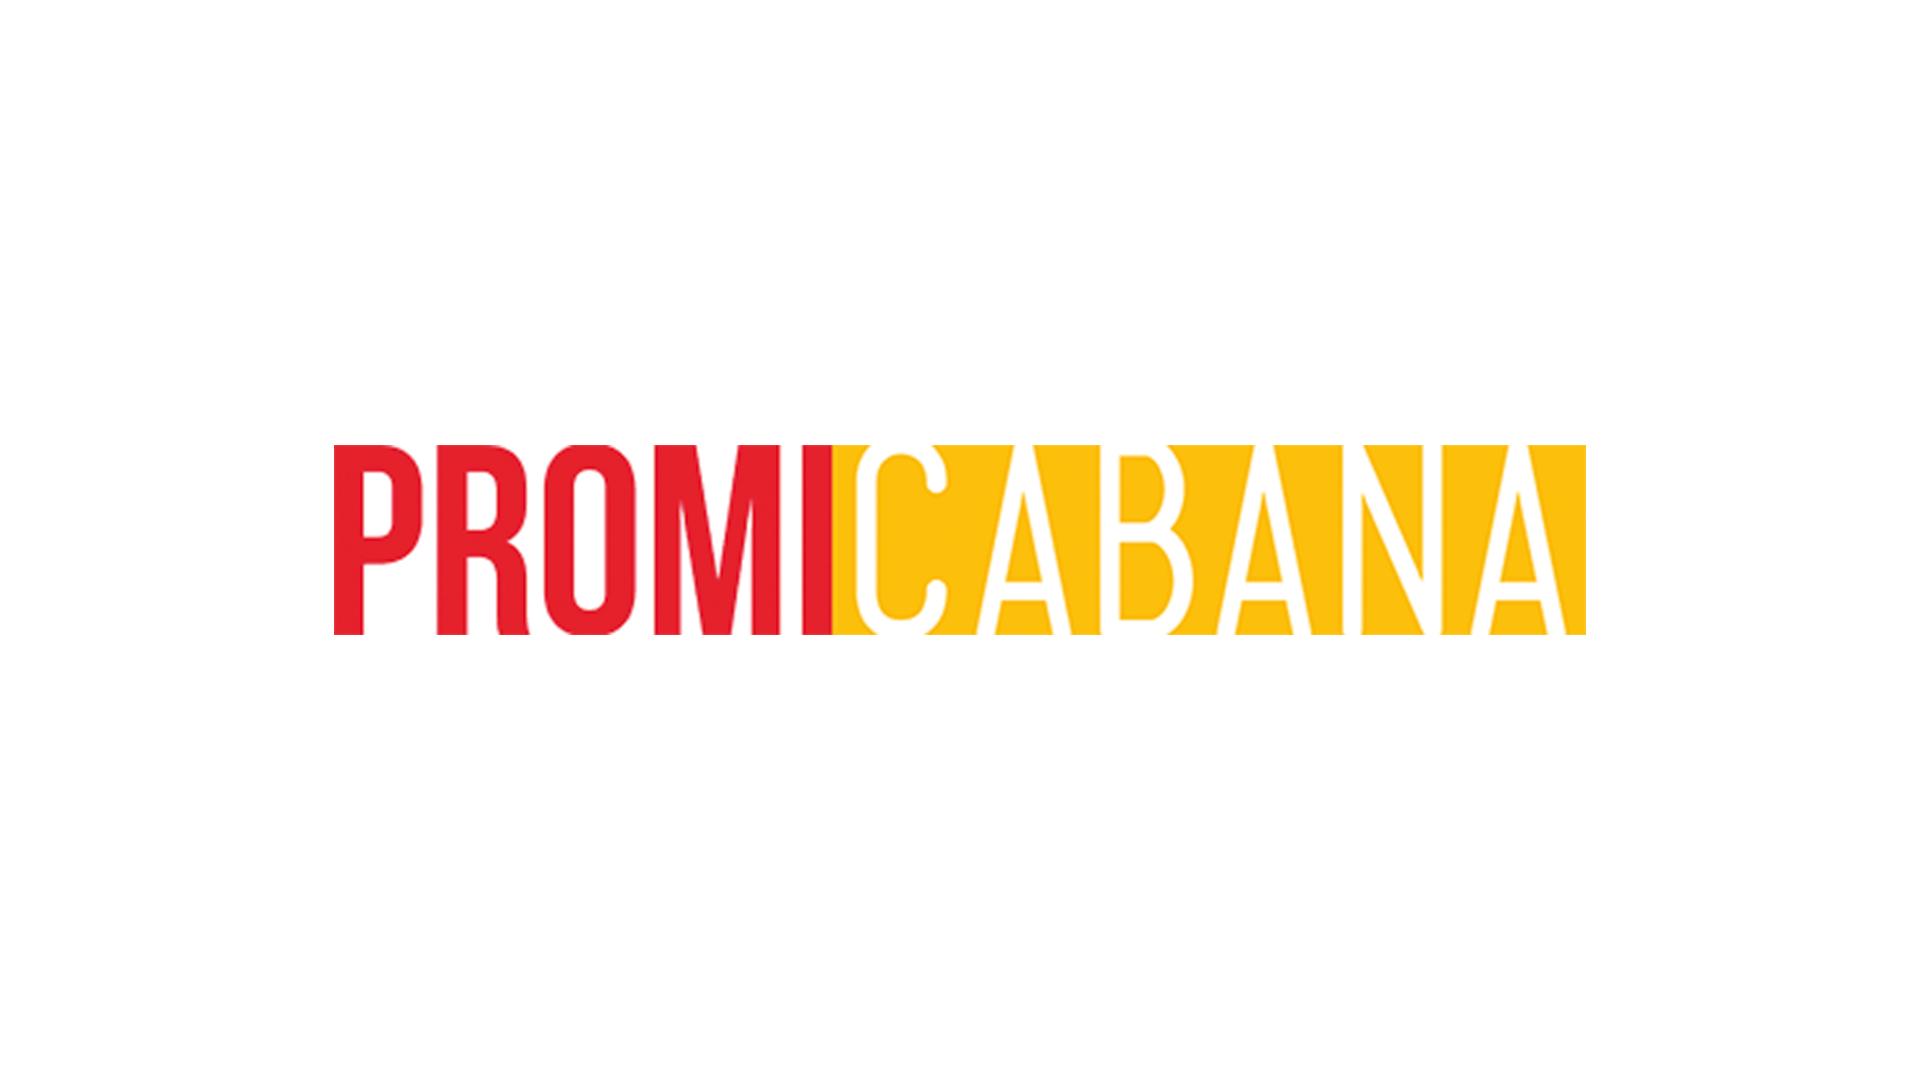 Two and a Half Men Ashton Kutcher Promo